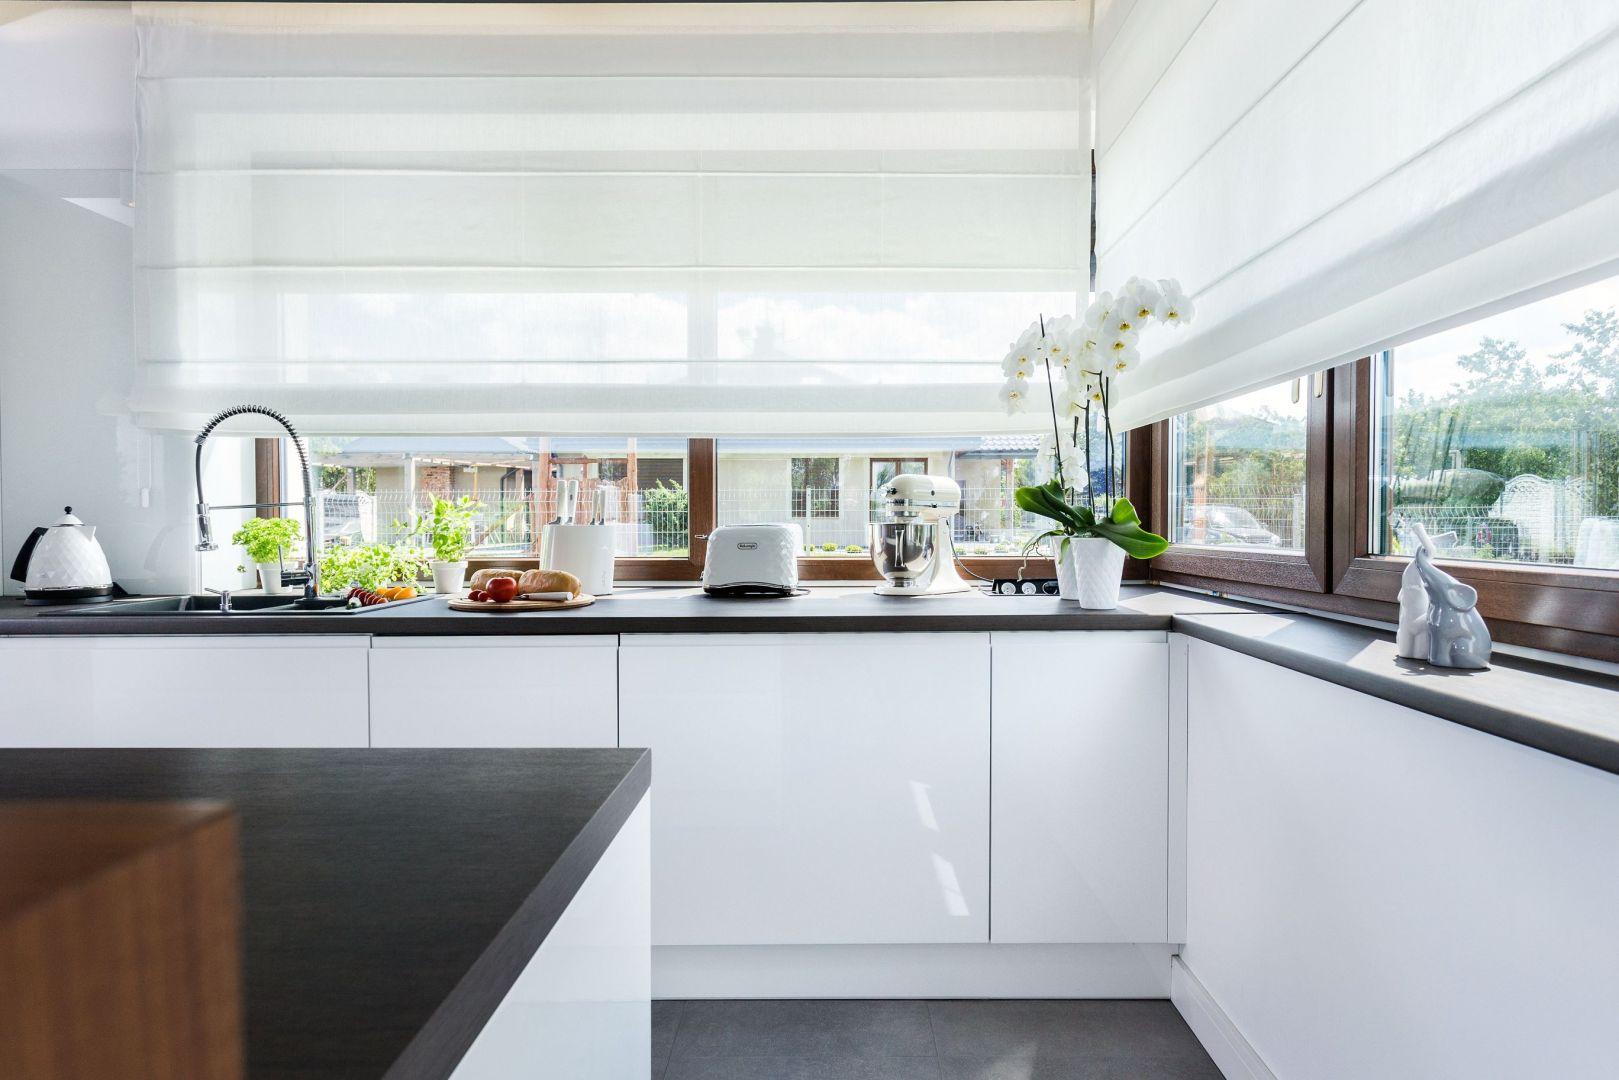 Jak zaaranżować okno w kuchni? Projekt Studio Meble Wach Max Kuchnie.